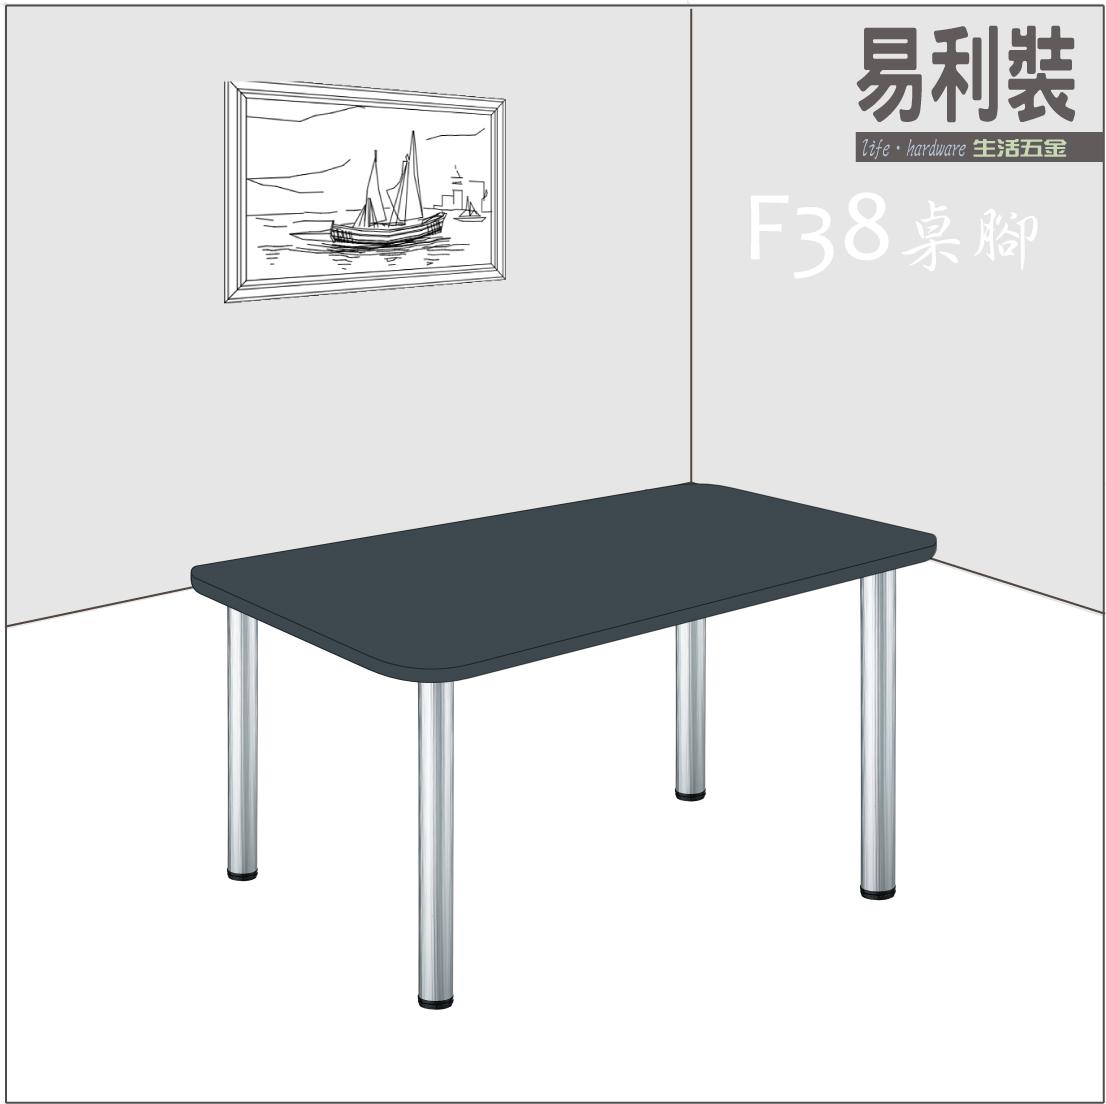 【 EASYCAN  】F38-餐桌腳 易利裝生活五金 櫥櫃腳 衣櫃腳 鞋櫃腳 書櫃腳 房間 臥房 衣櫃 小資族 辦公家具 系統家具